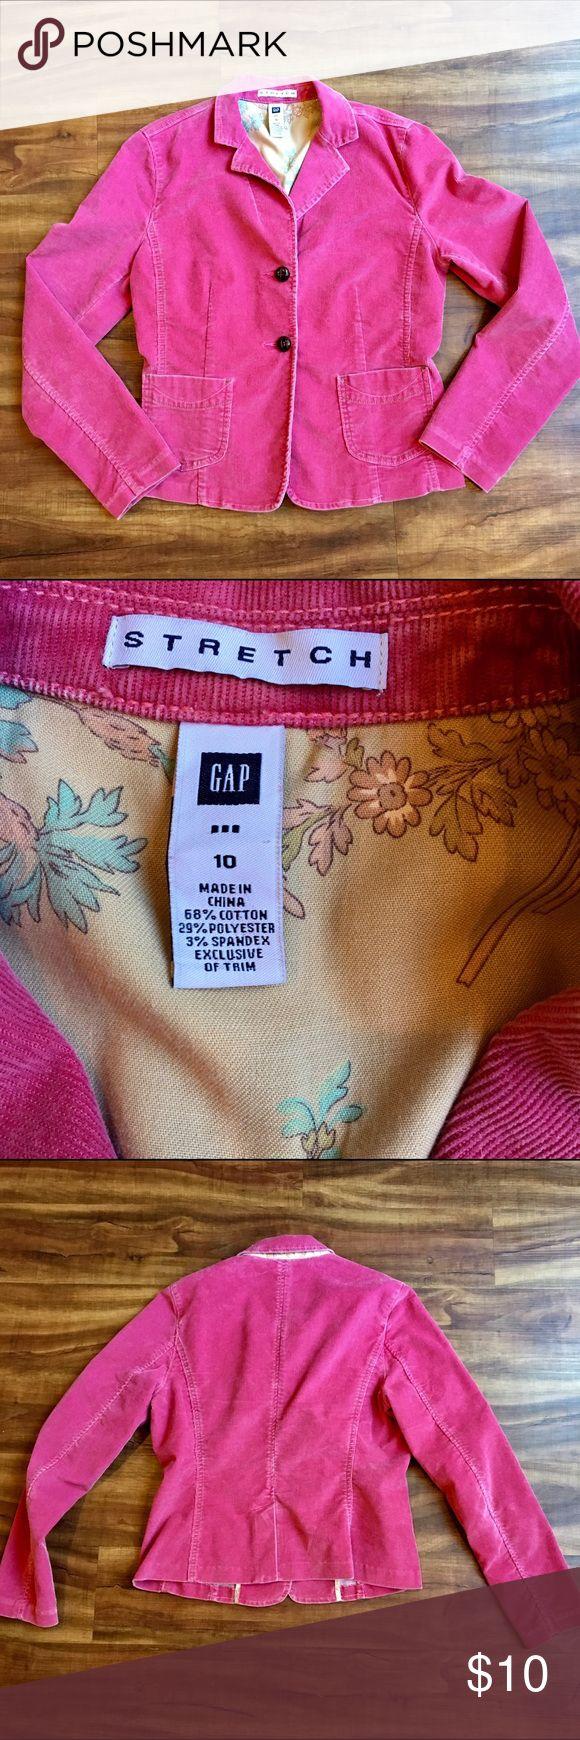 Vintage GAP jacket GAP pink corduroy blazer size 10. Vintage look in good condition  20% off bundles GAP Jackets & Coats Blazers